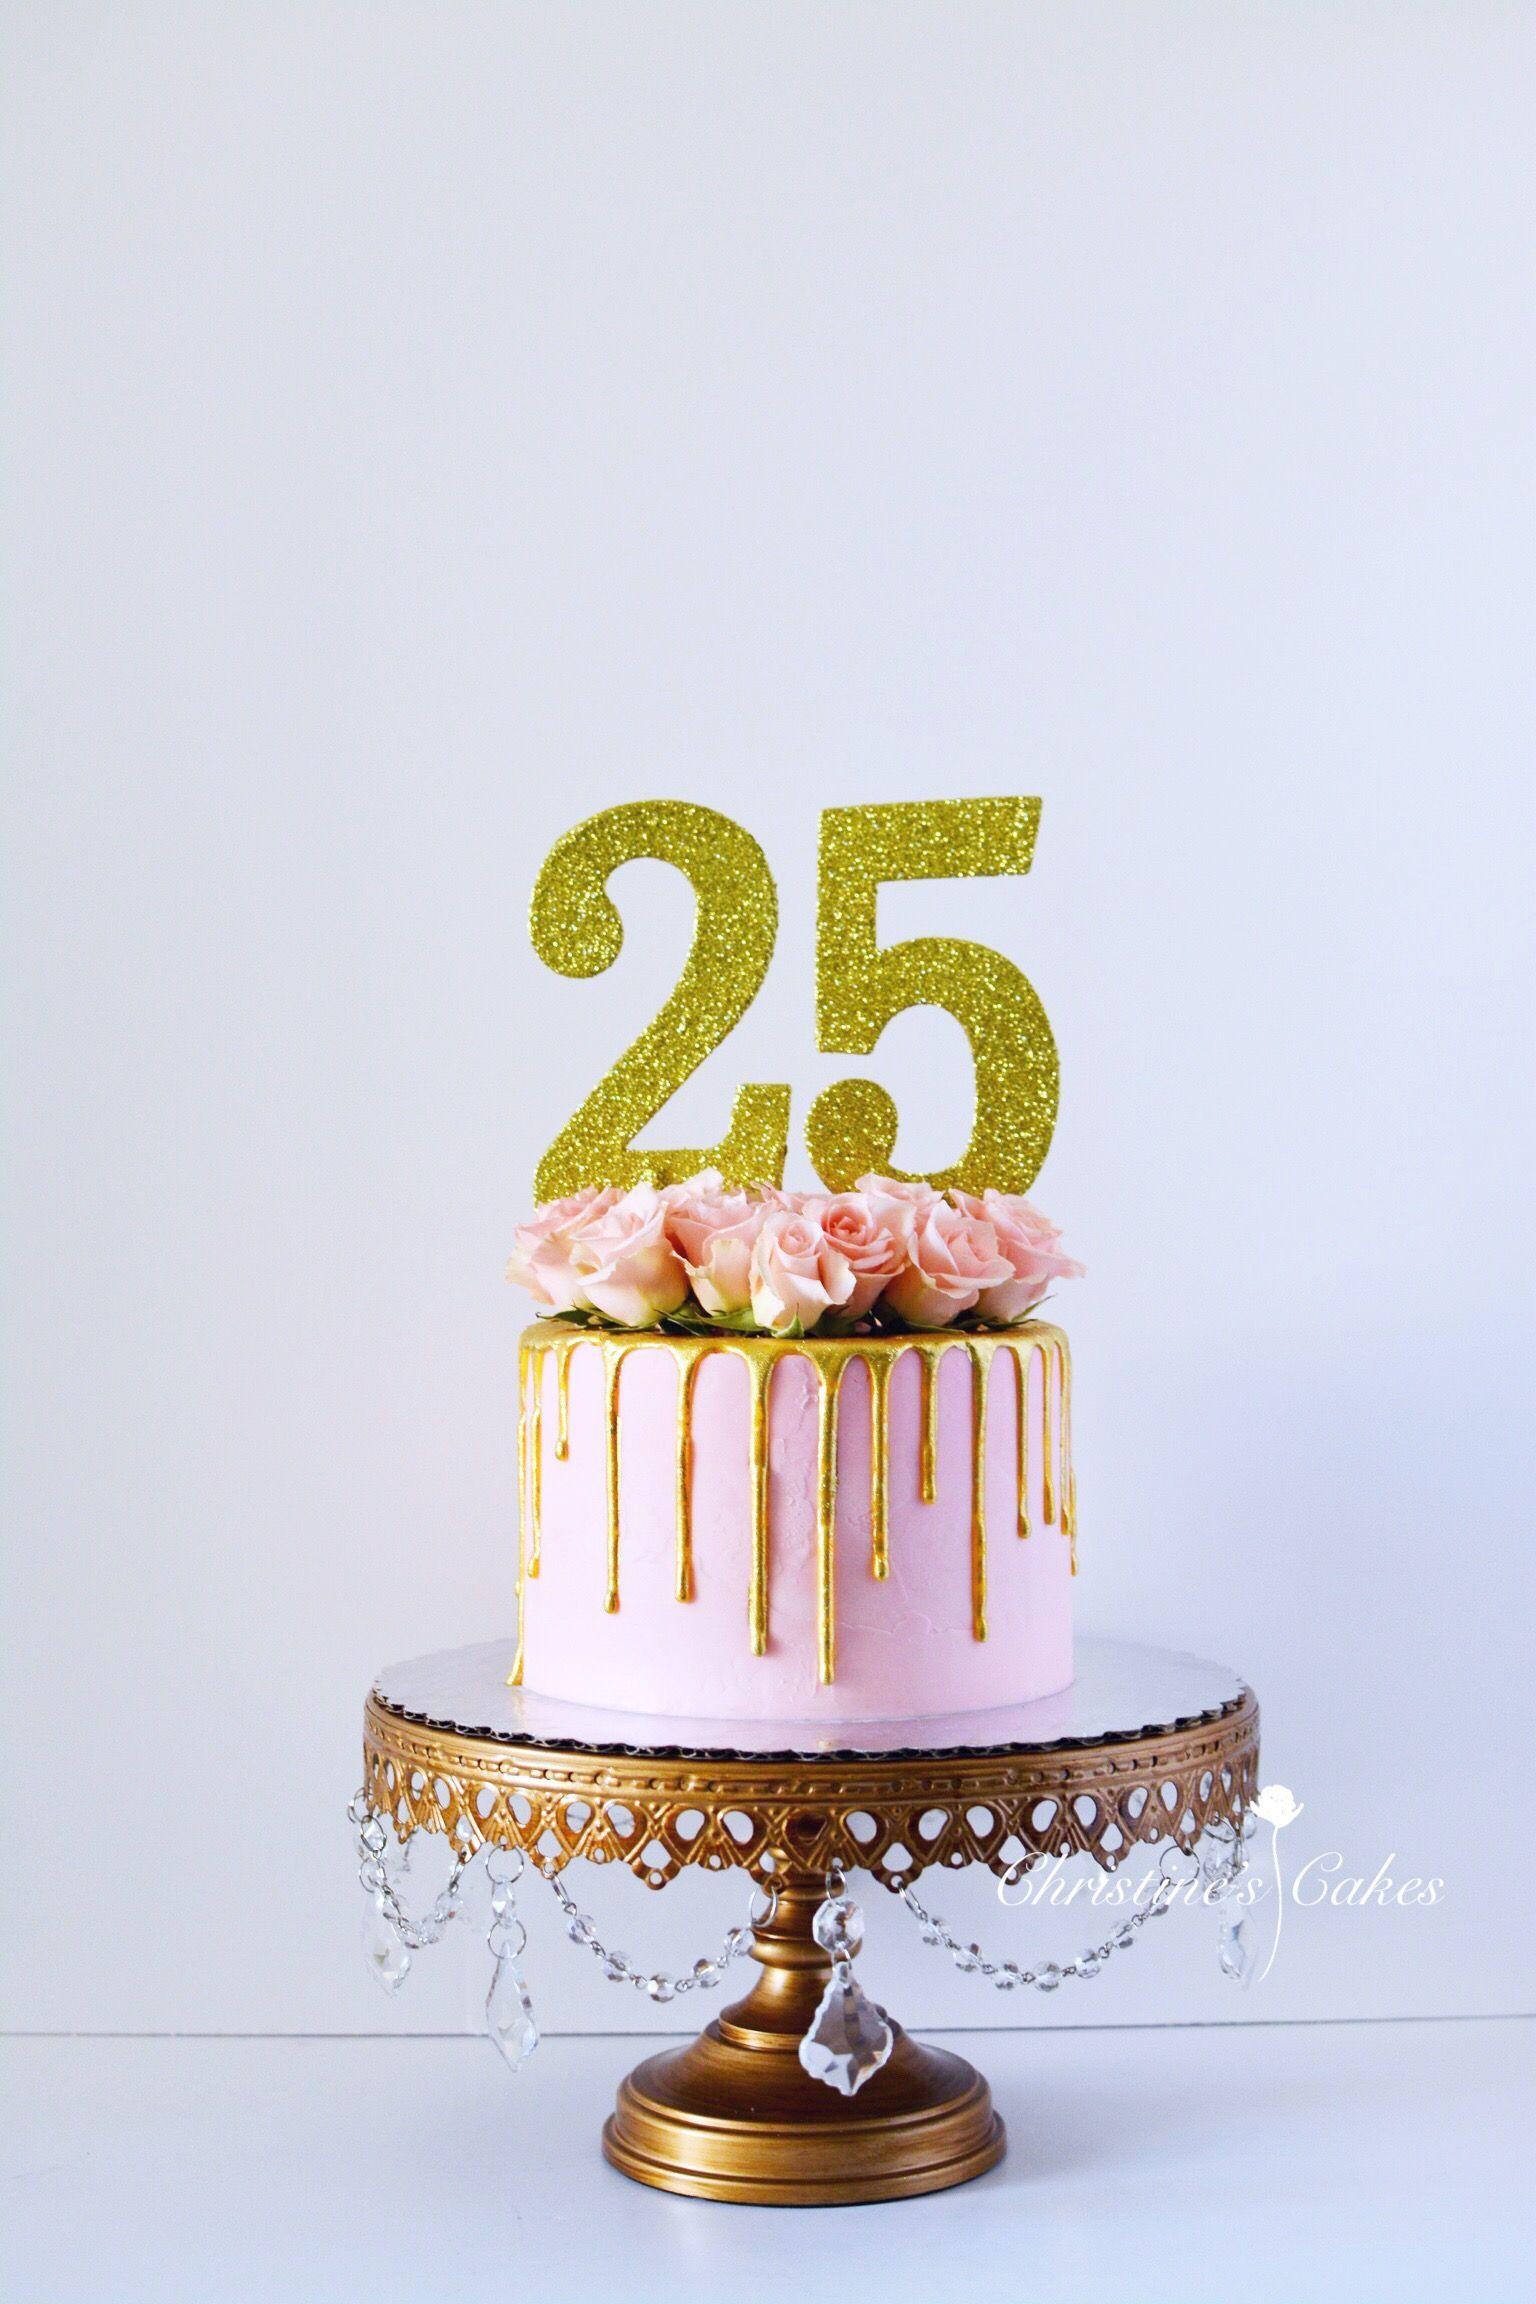 Fabulous 27 Amazing Image Of 25 Birthday Cake Verjaardagstaart Ideeen Personalised Birthday Cards Petedlily Jamesorg